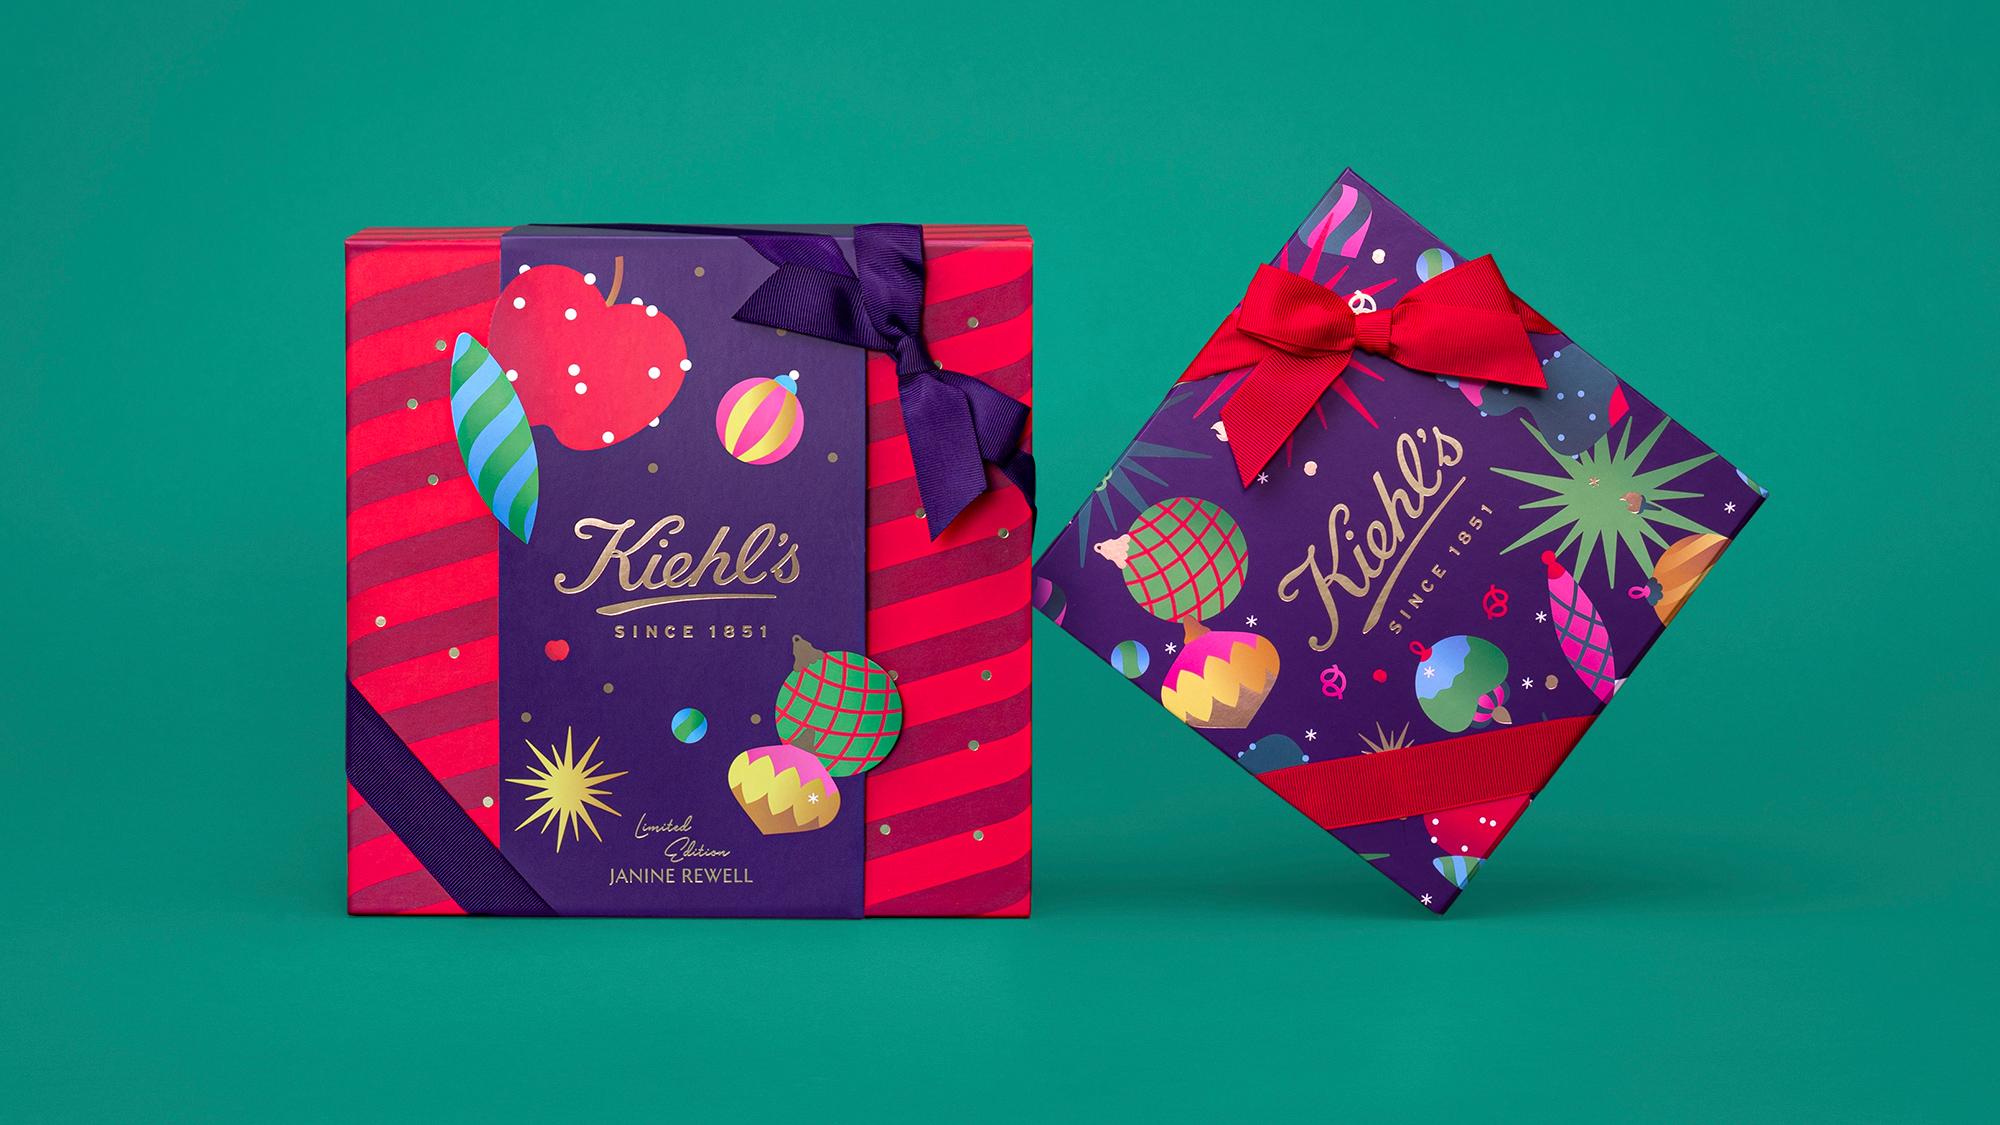 AP_Janine_Rewell-Kiehls-packaging2_2x